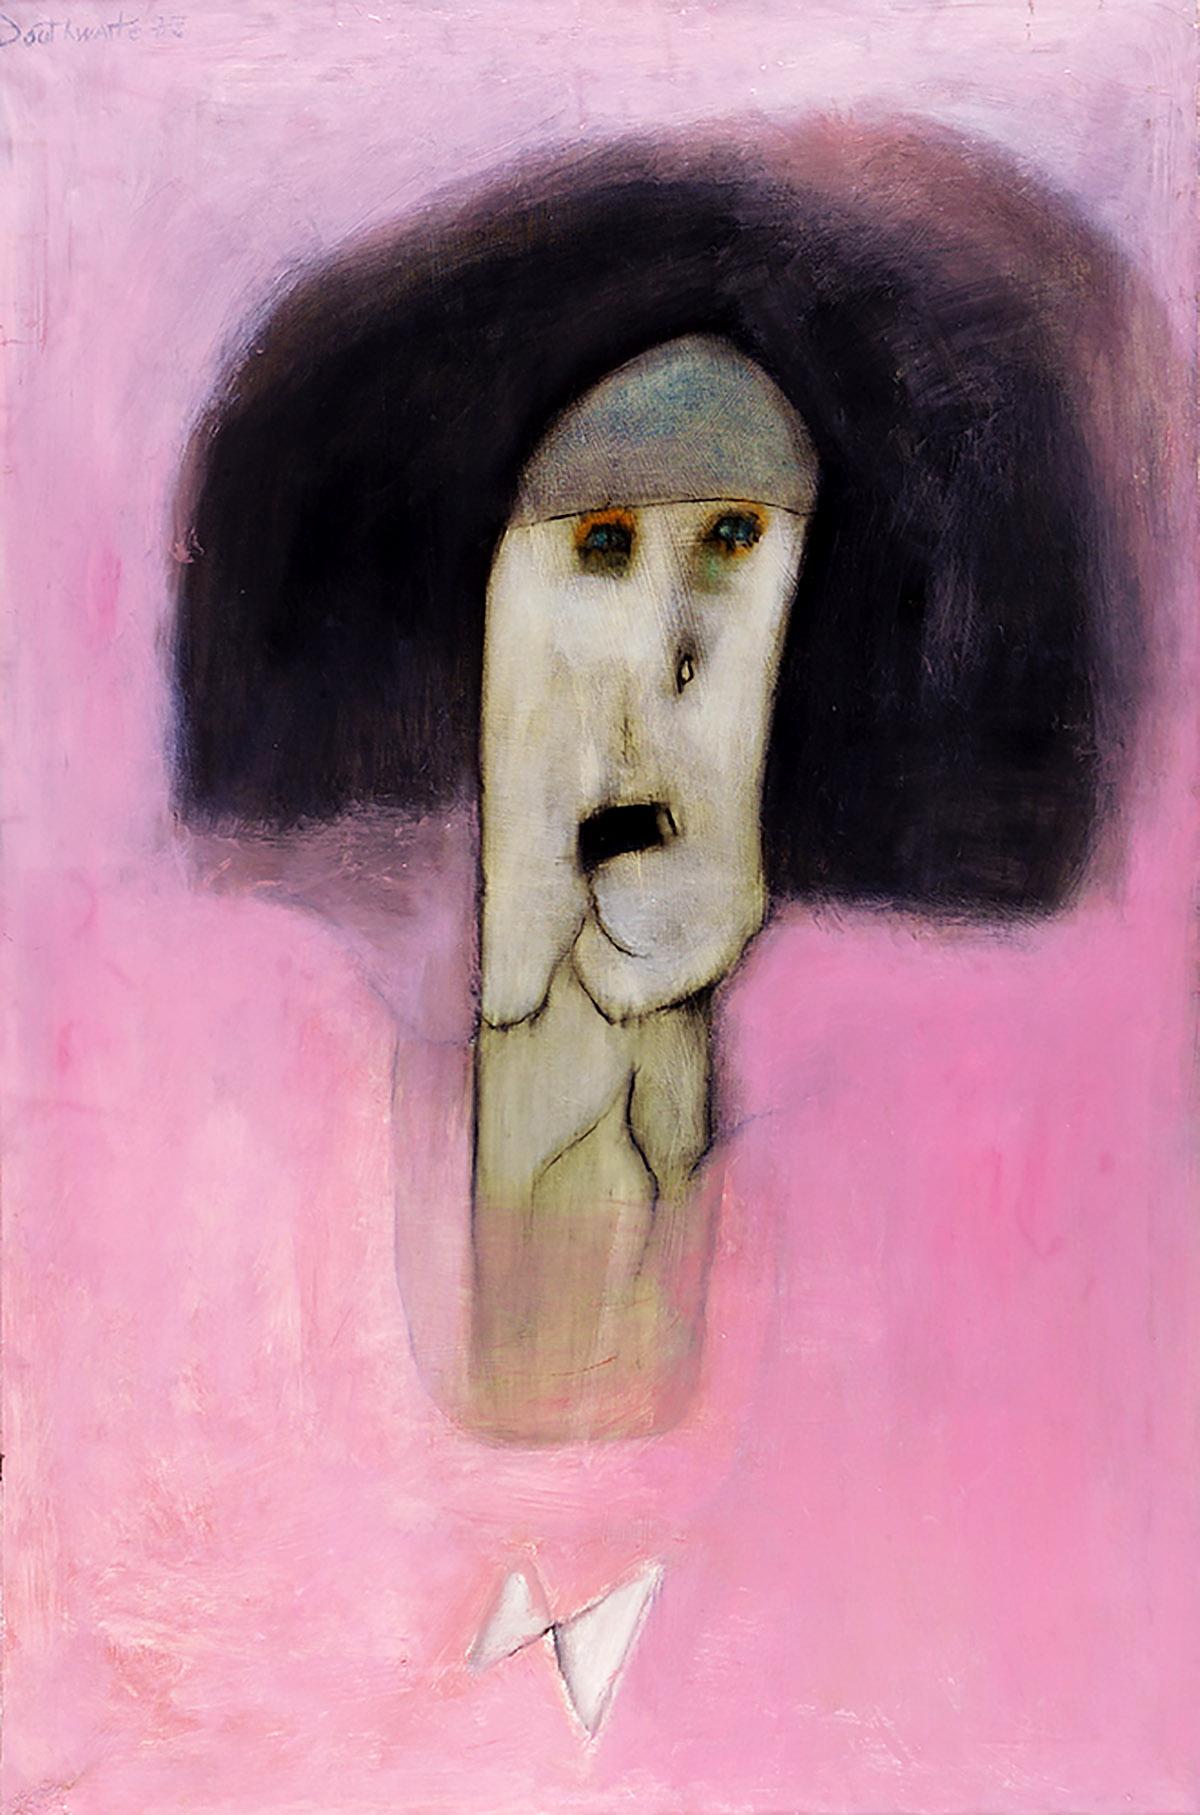 Pat Douthwaite, 'Madeline', oil on canvas